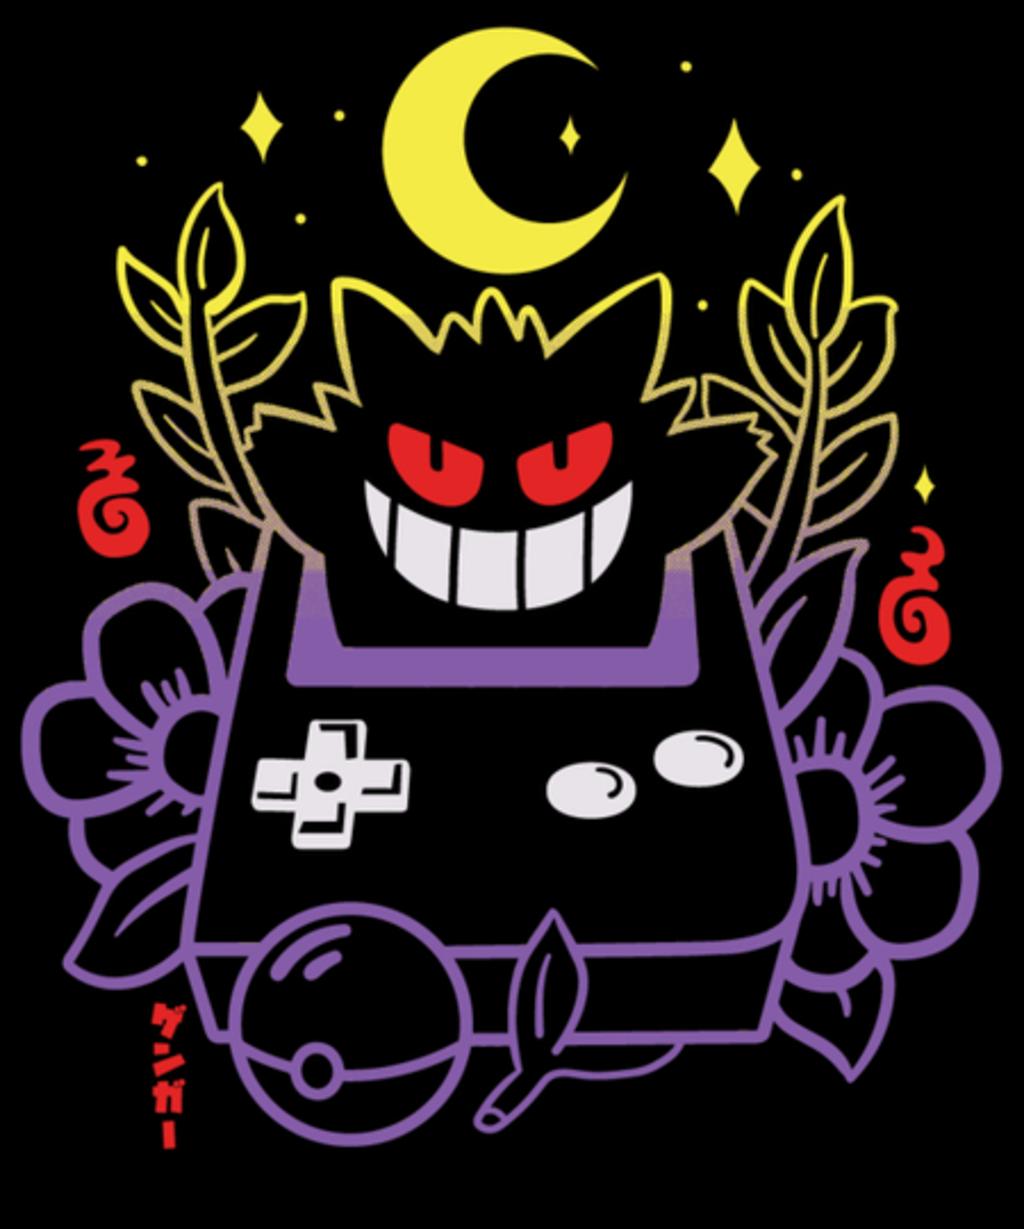 Qwertee: Pocket ghost